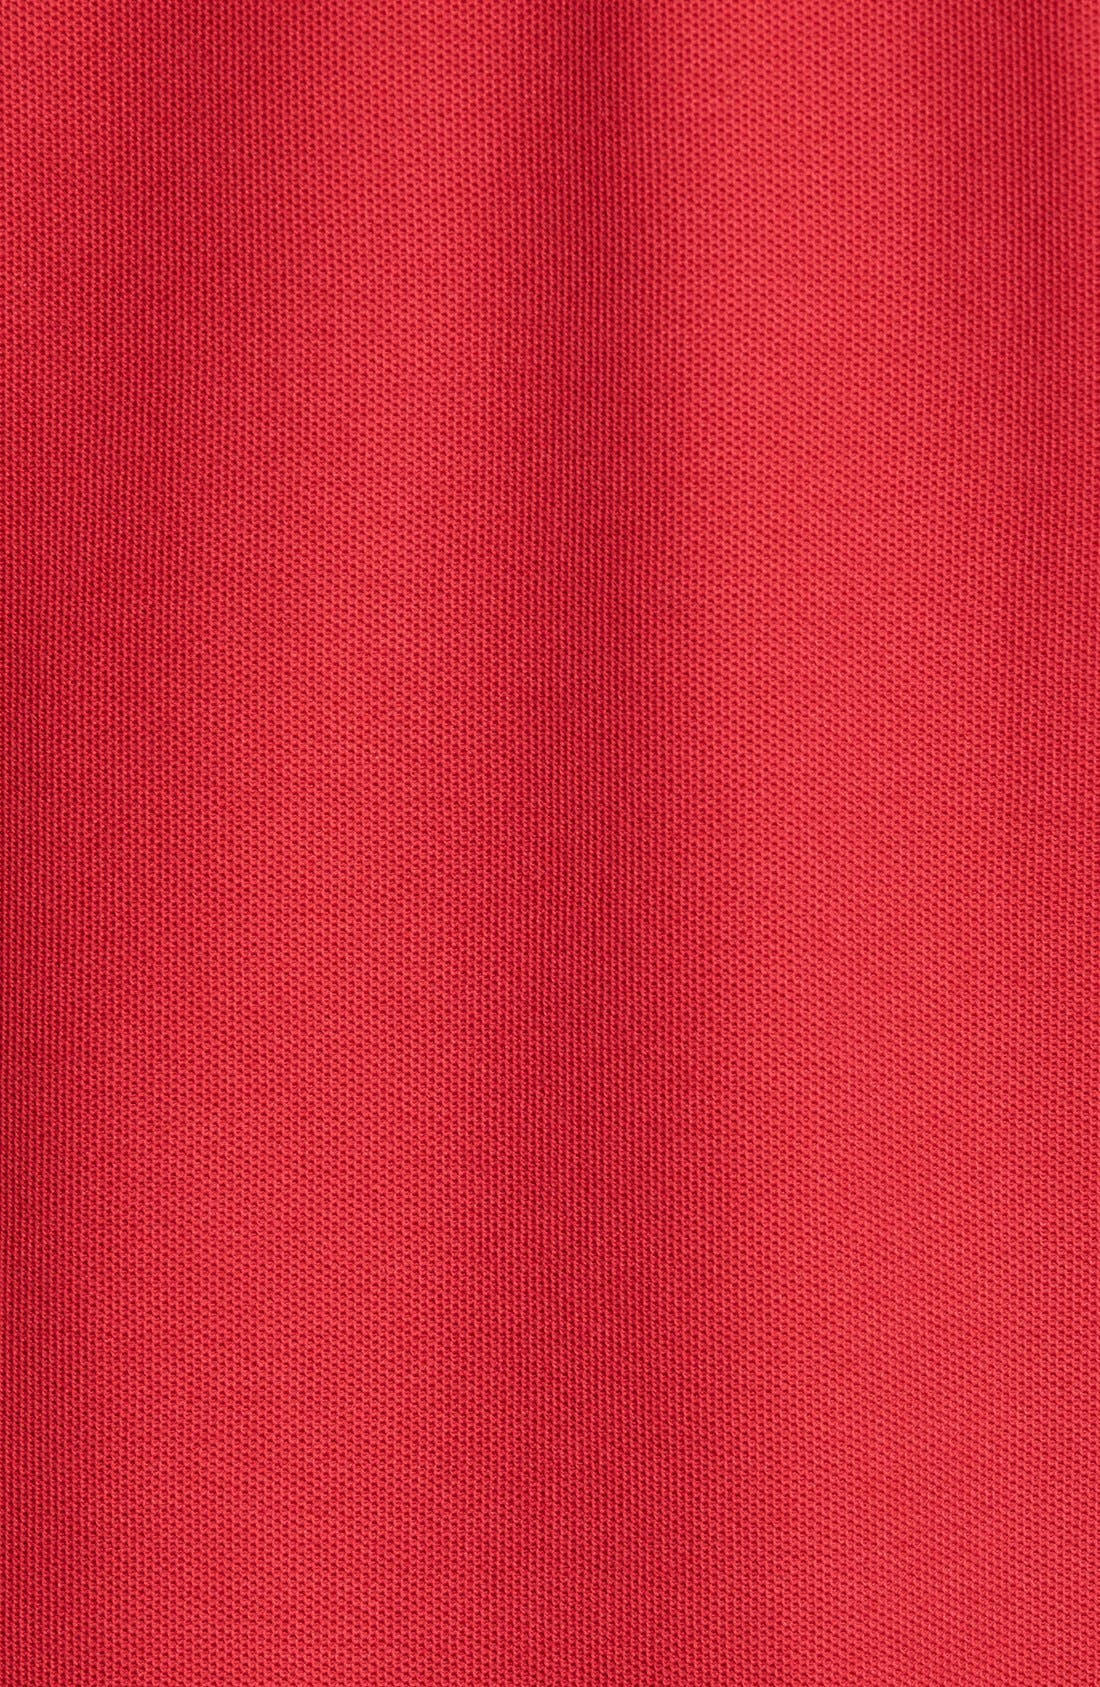 Alternate Image 4  - Nordstrom Men's Shop 'Classic' Regular Fit Piqué Polo (Big)